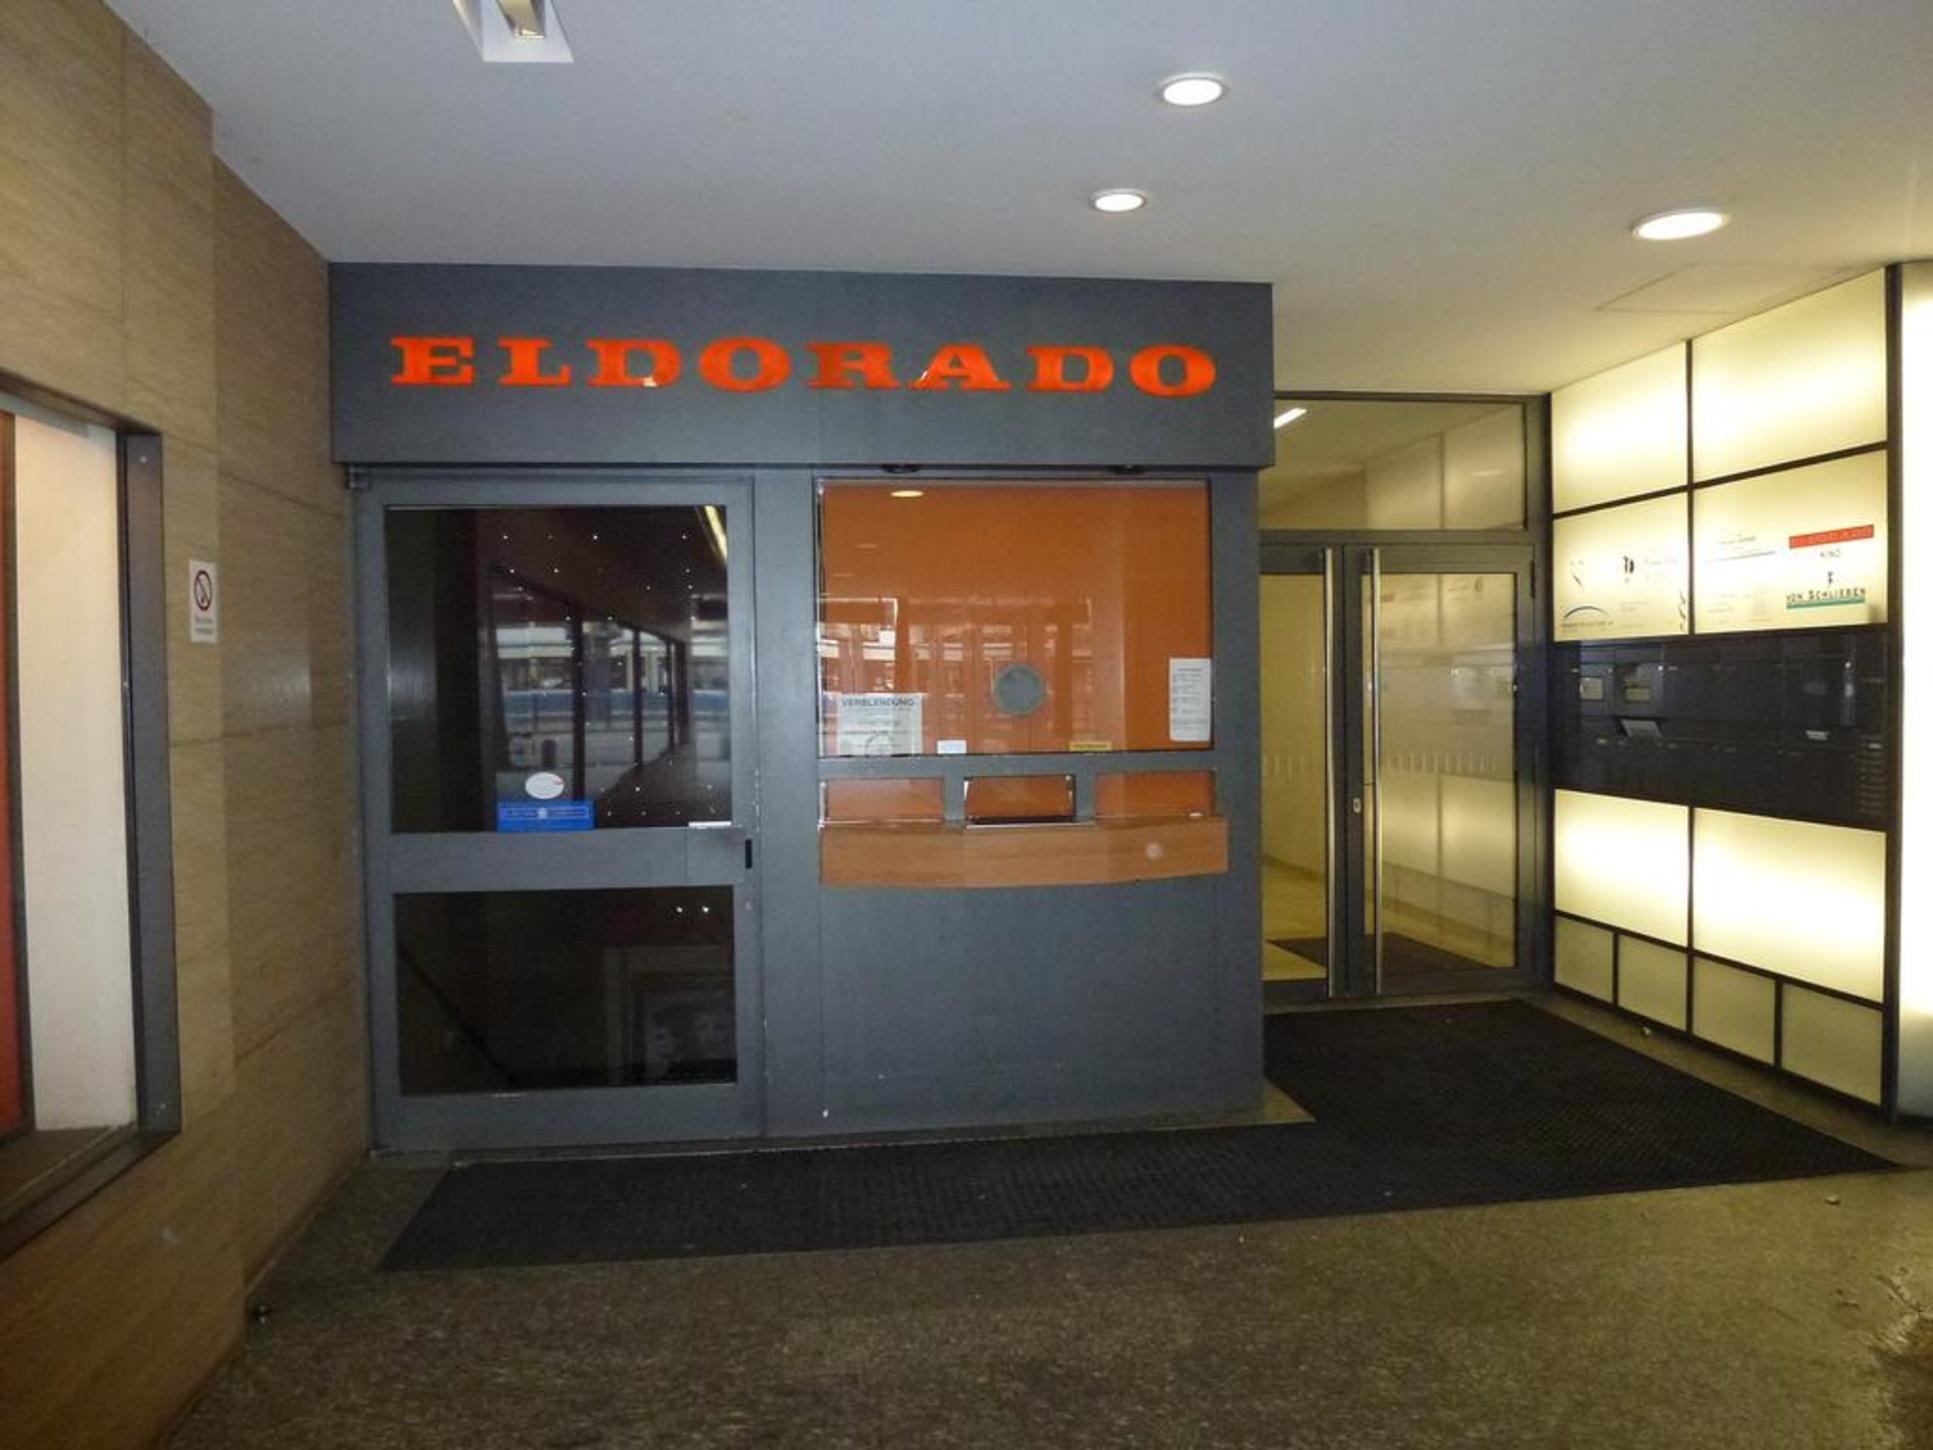 Kino Sonnenstraße München Eldorado